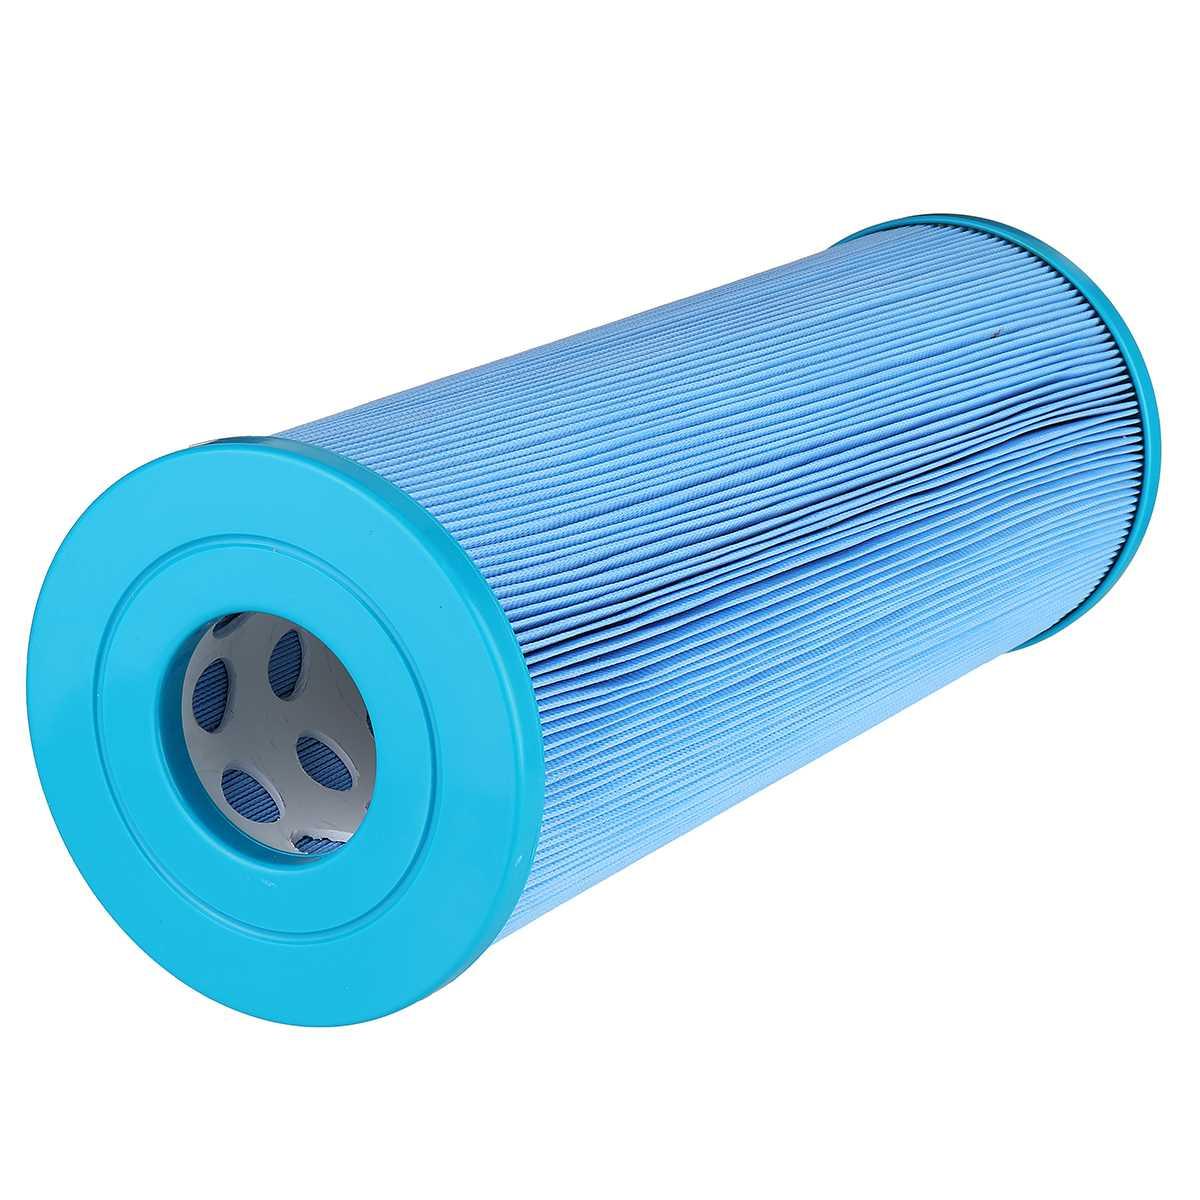 filtro C-4326 banheira de hidromassagem cartucho filtros